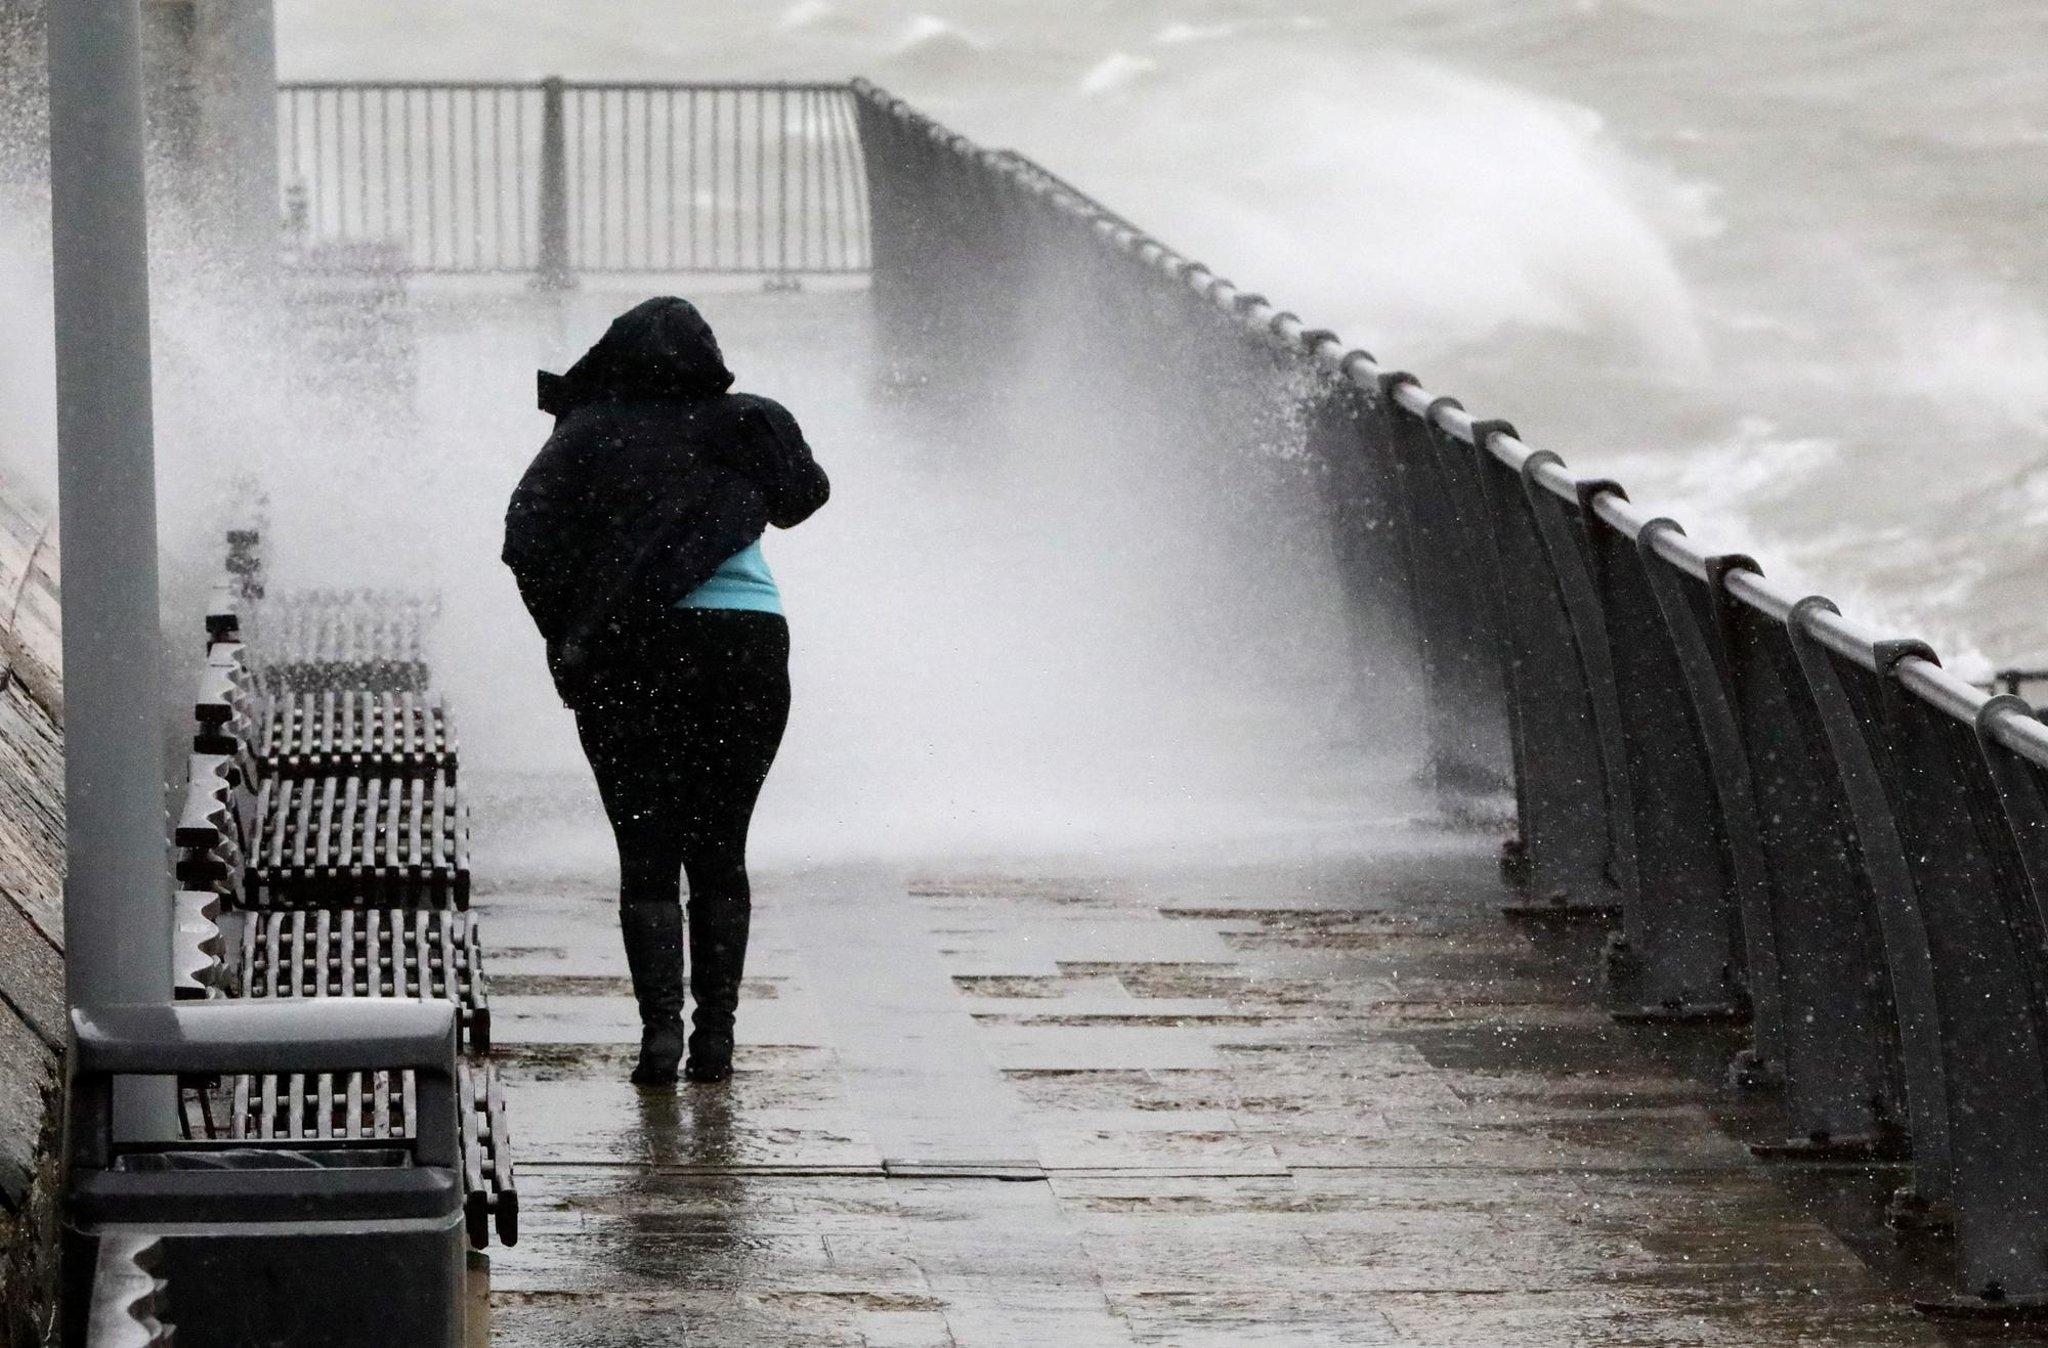 storm christoph - photo #4